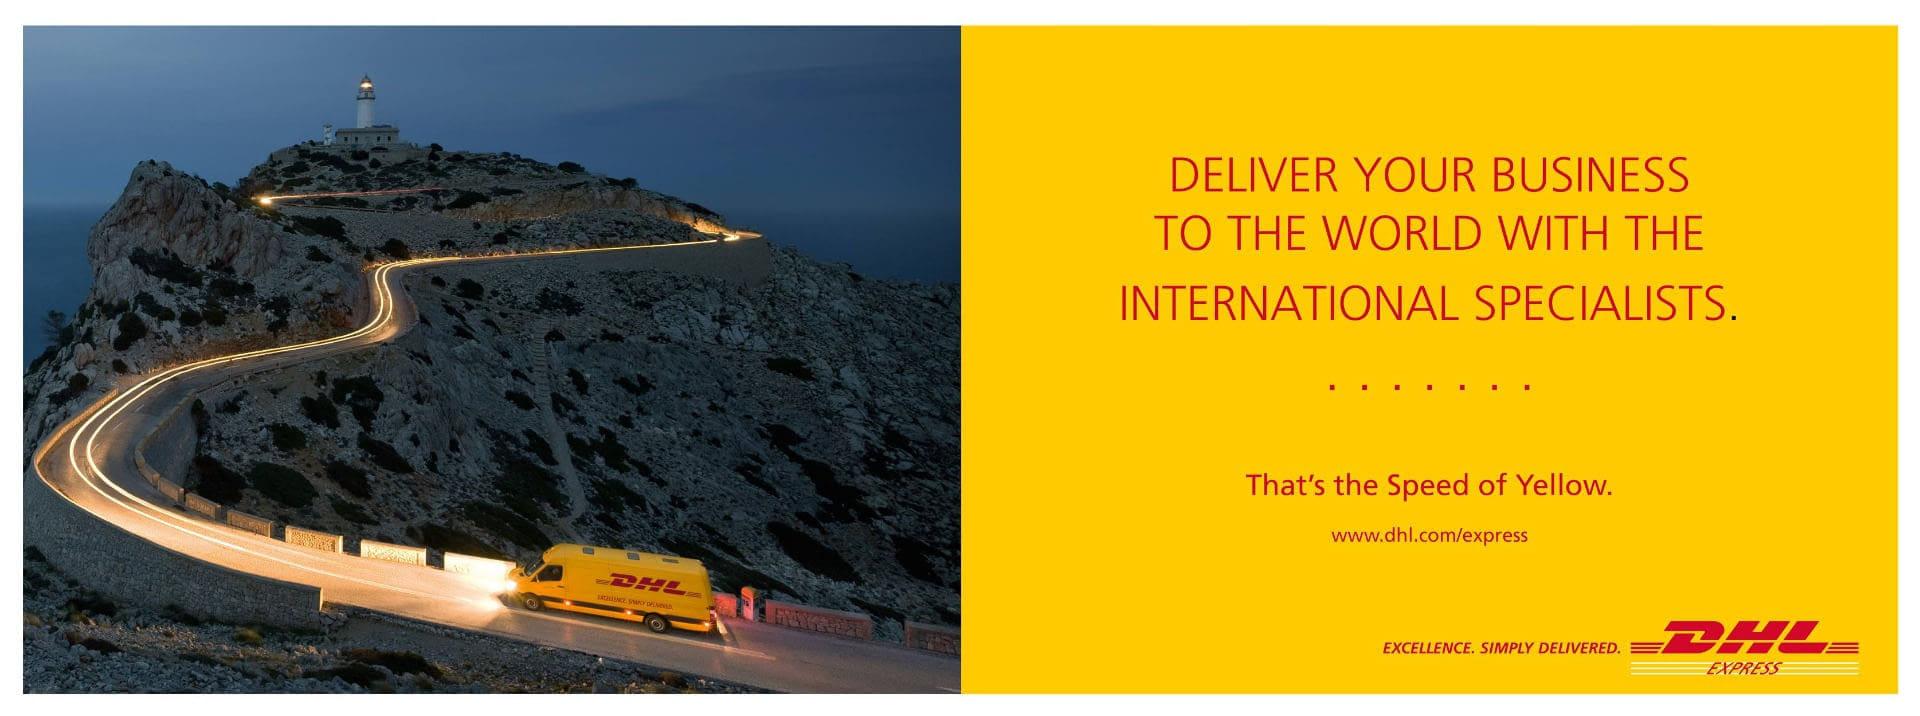 DHL International Ltd - Courier Service in Luqa, Malta